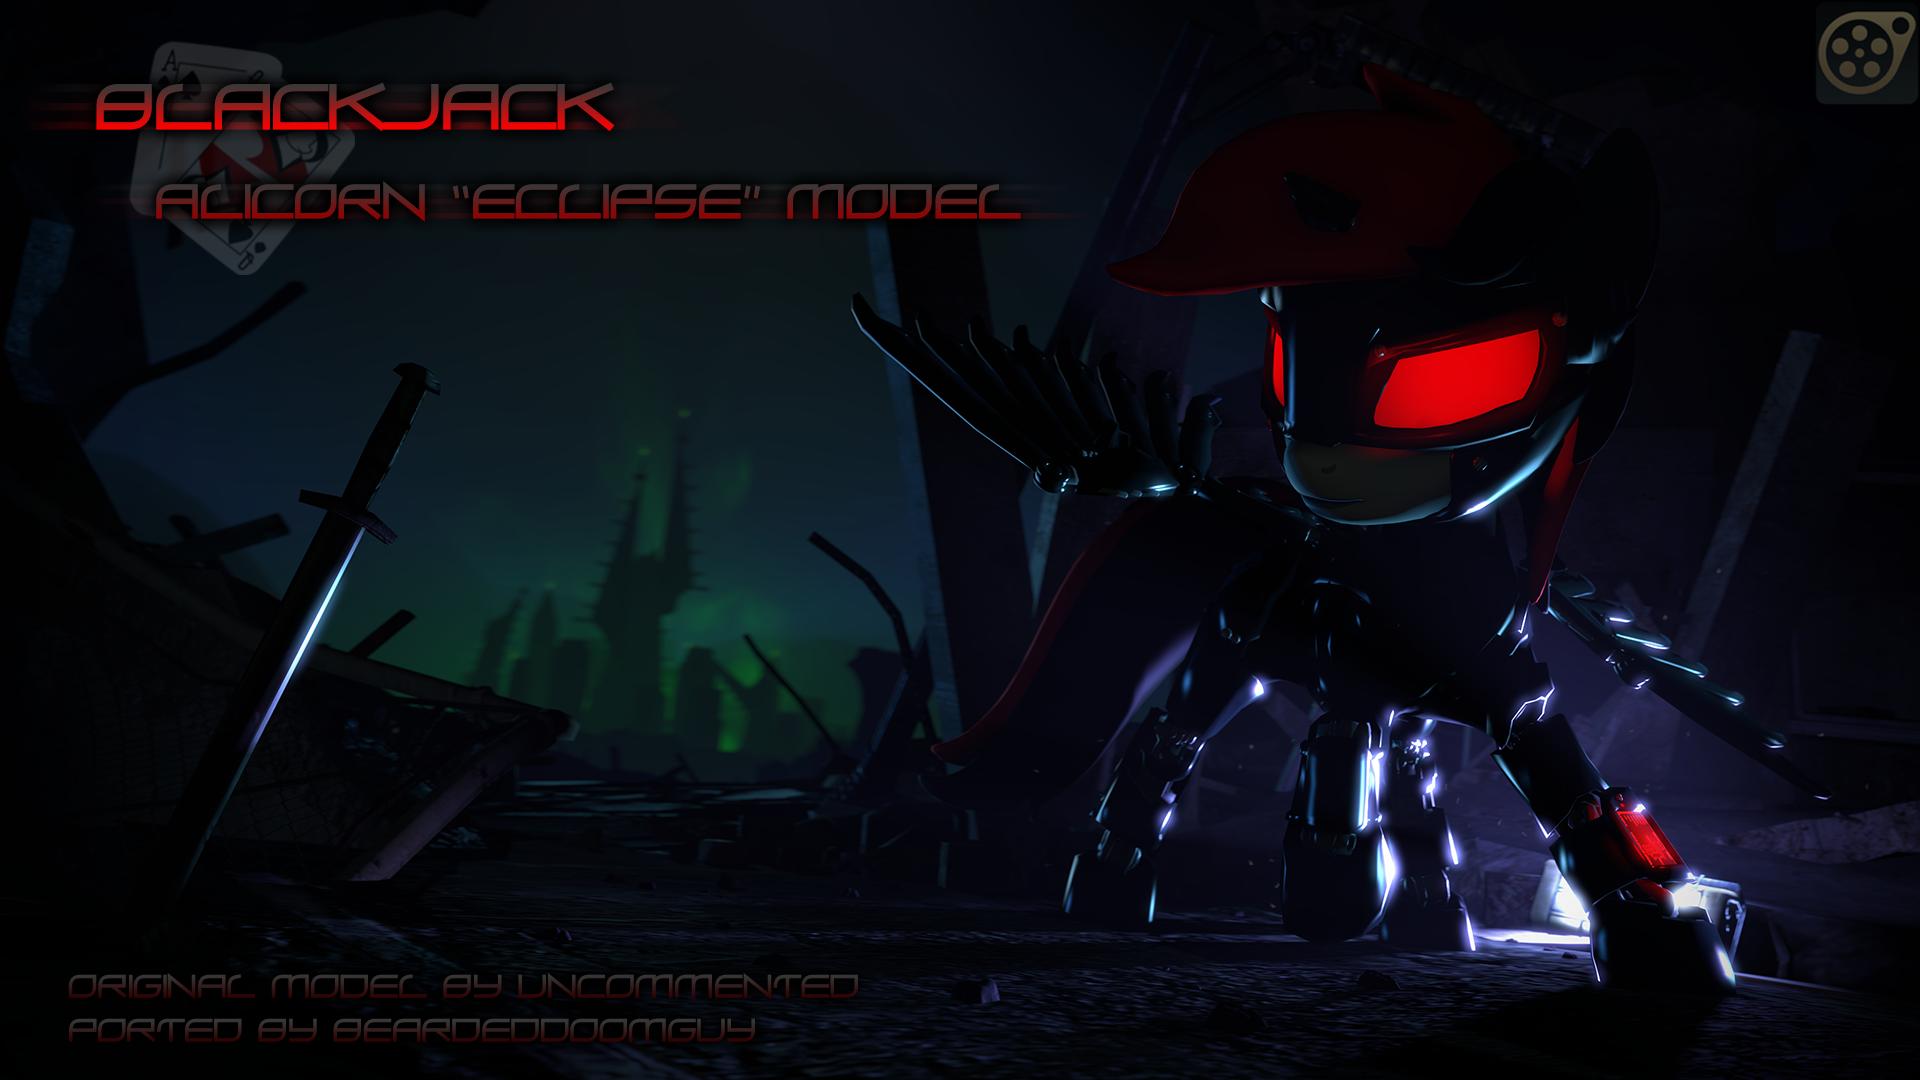 [DL] FO:E Blackjack alicorn armor